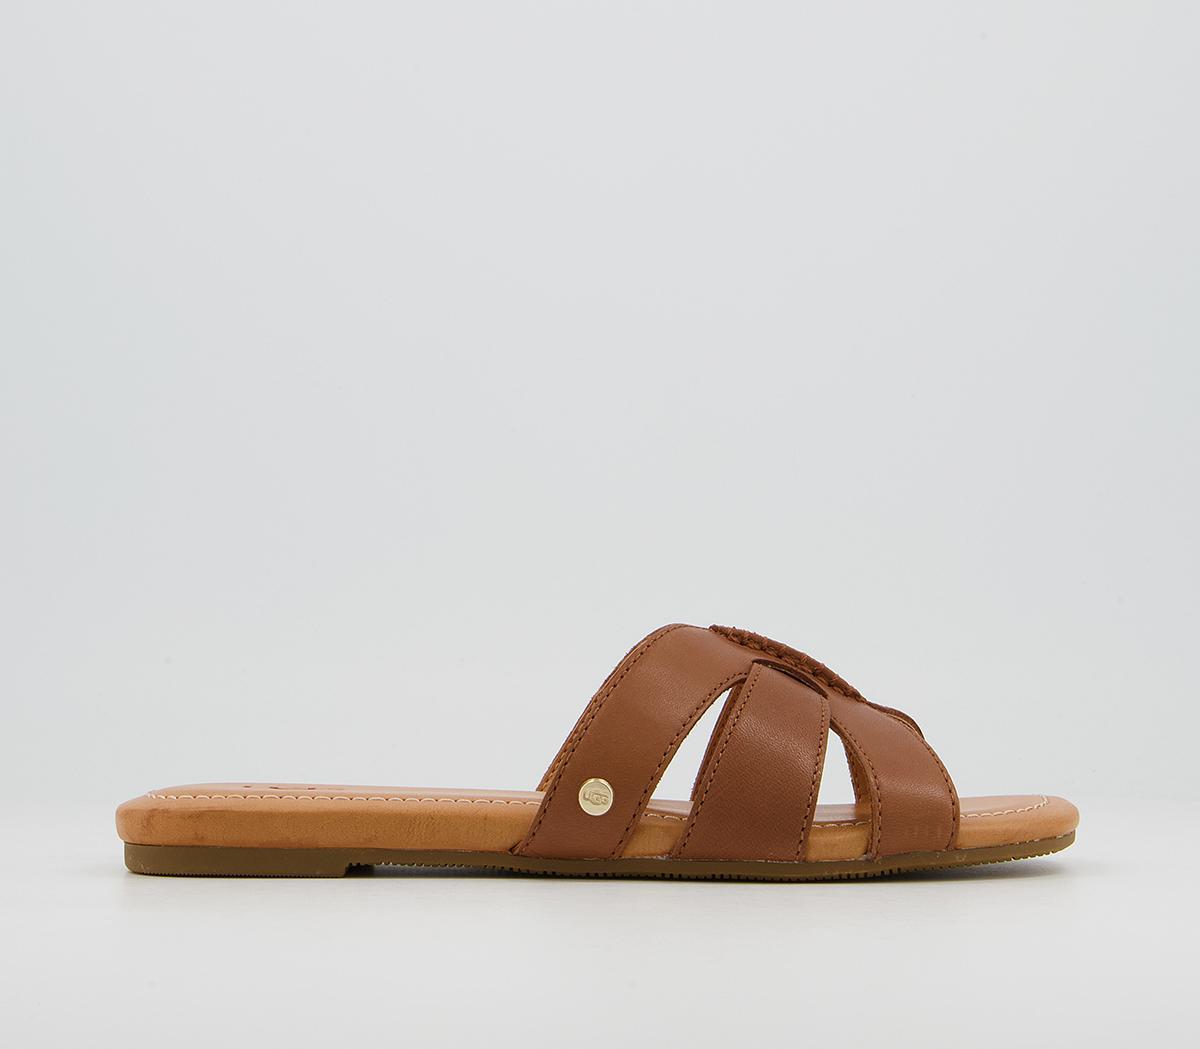 Teague Sandals